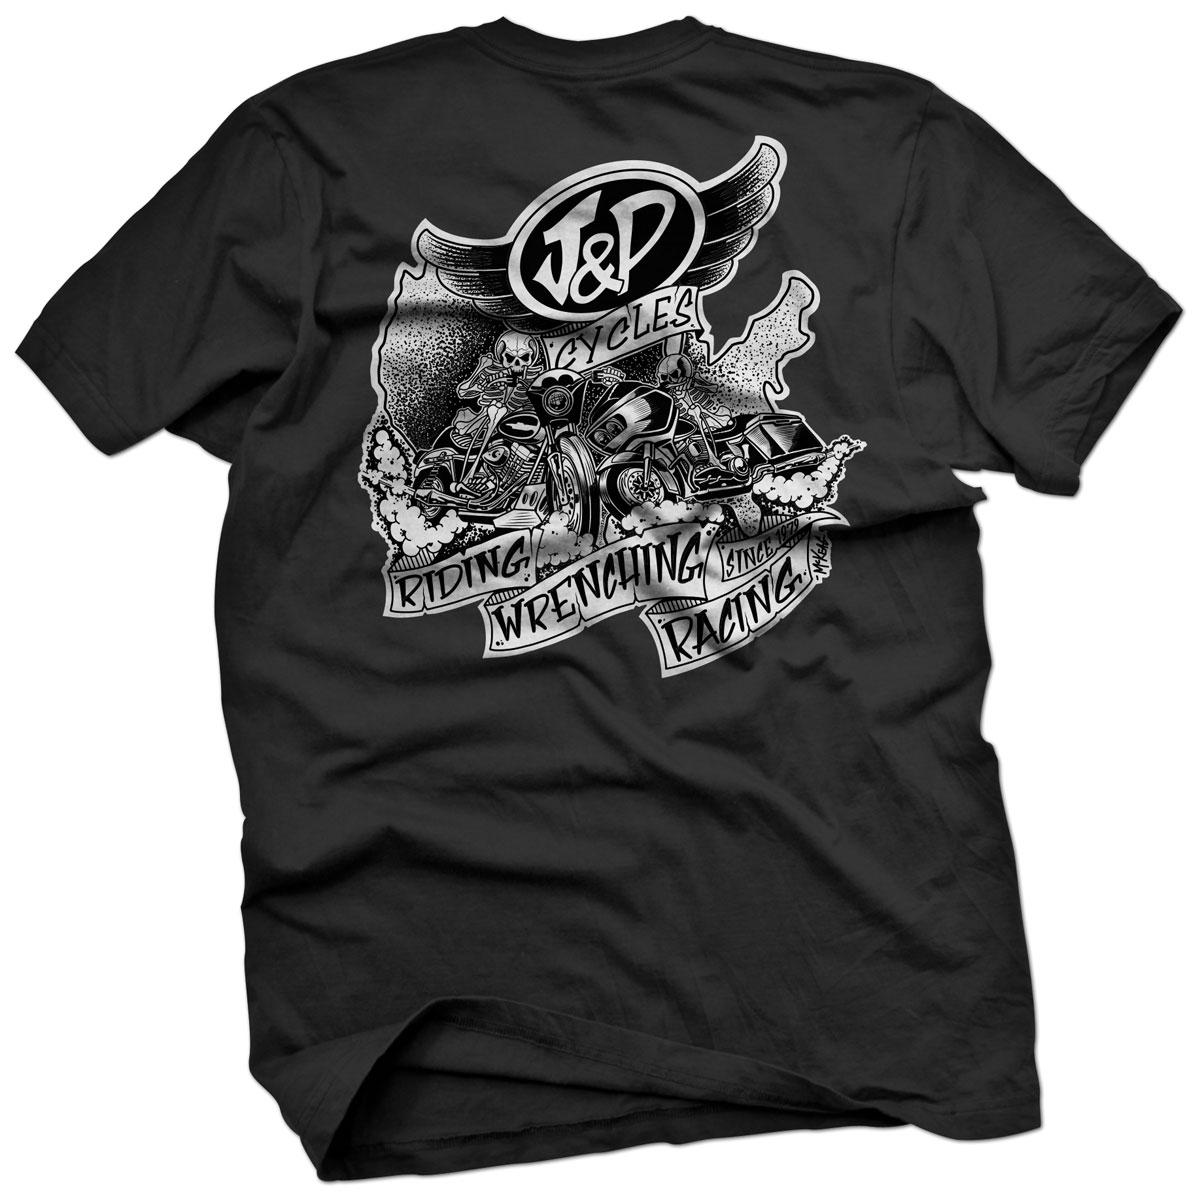 J&P Cycles Exclusive Darren McKeag Black T-Shirt